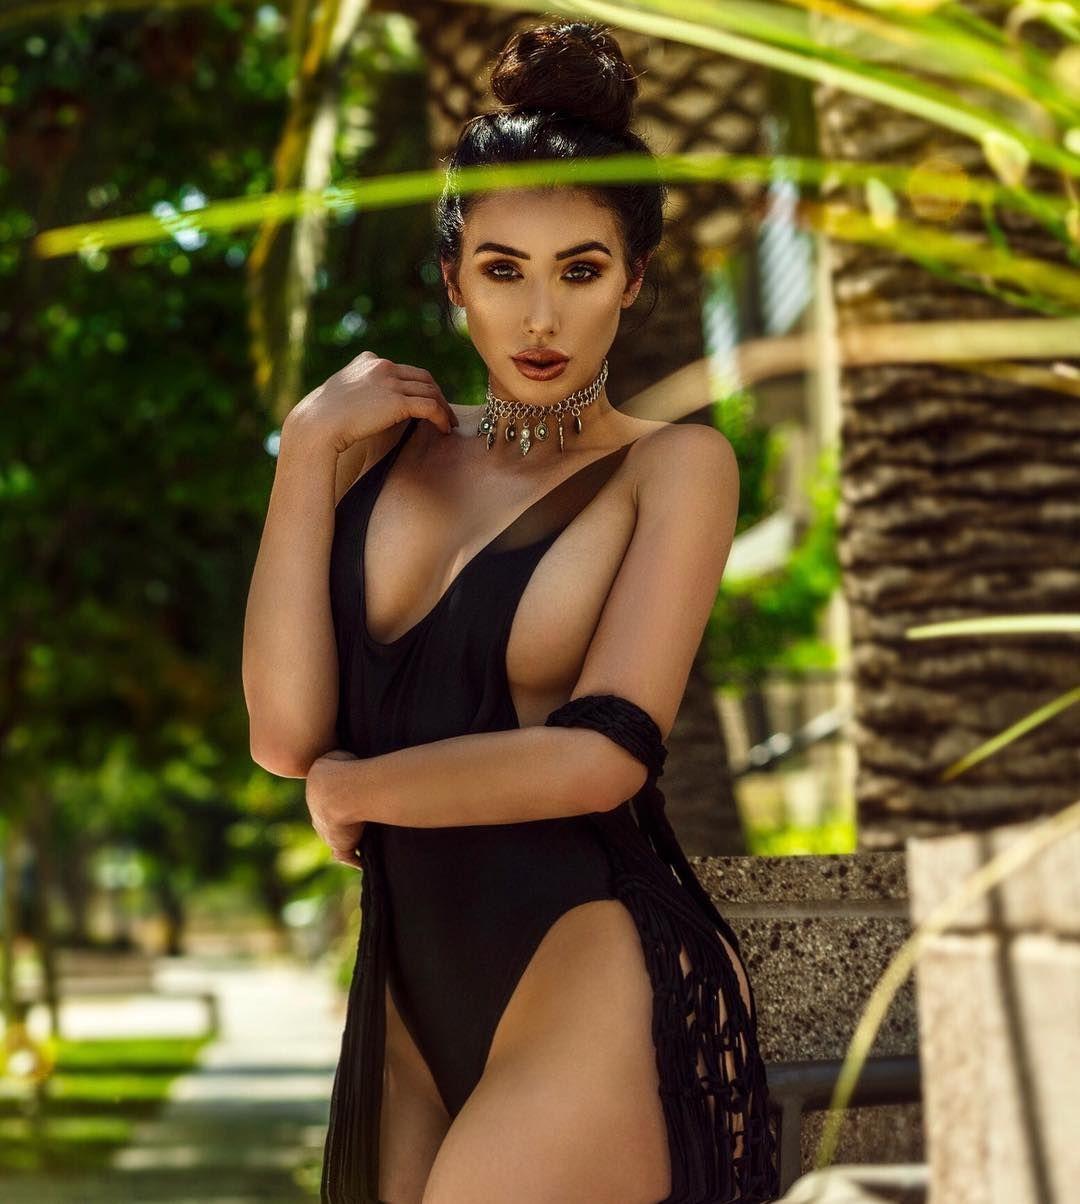 showing xxx images for adina saggy tits xxx | www.fuckpix.club